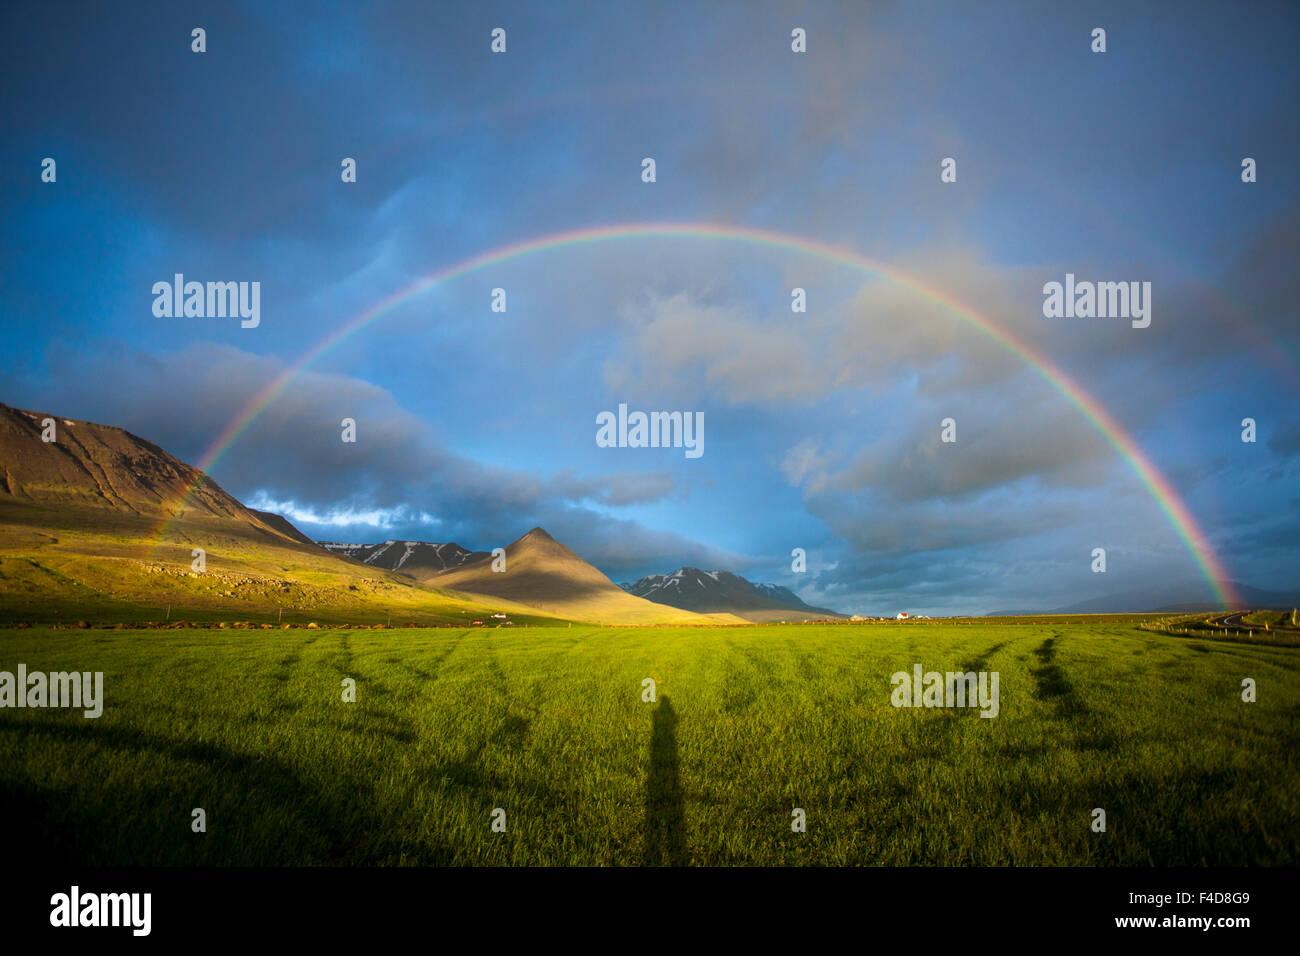 Sera rainbow oltre la valle Heradsvotn, Skagafjordur, Nordhurland Vestra, Islanda. Immagini Stock